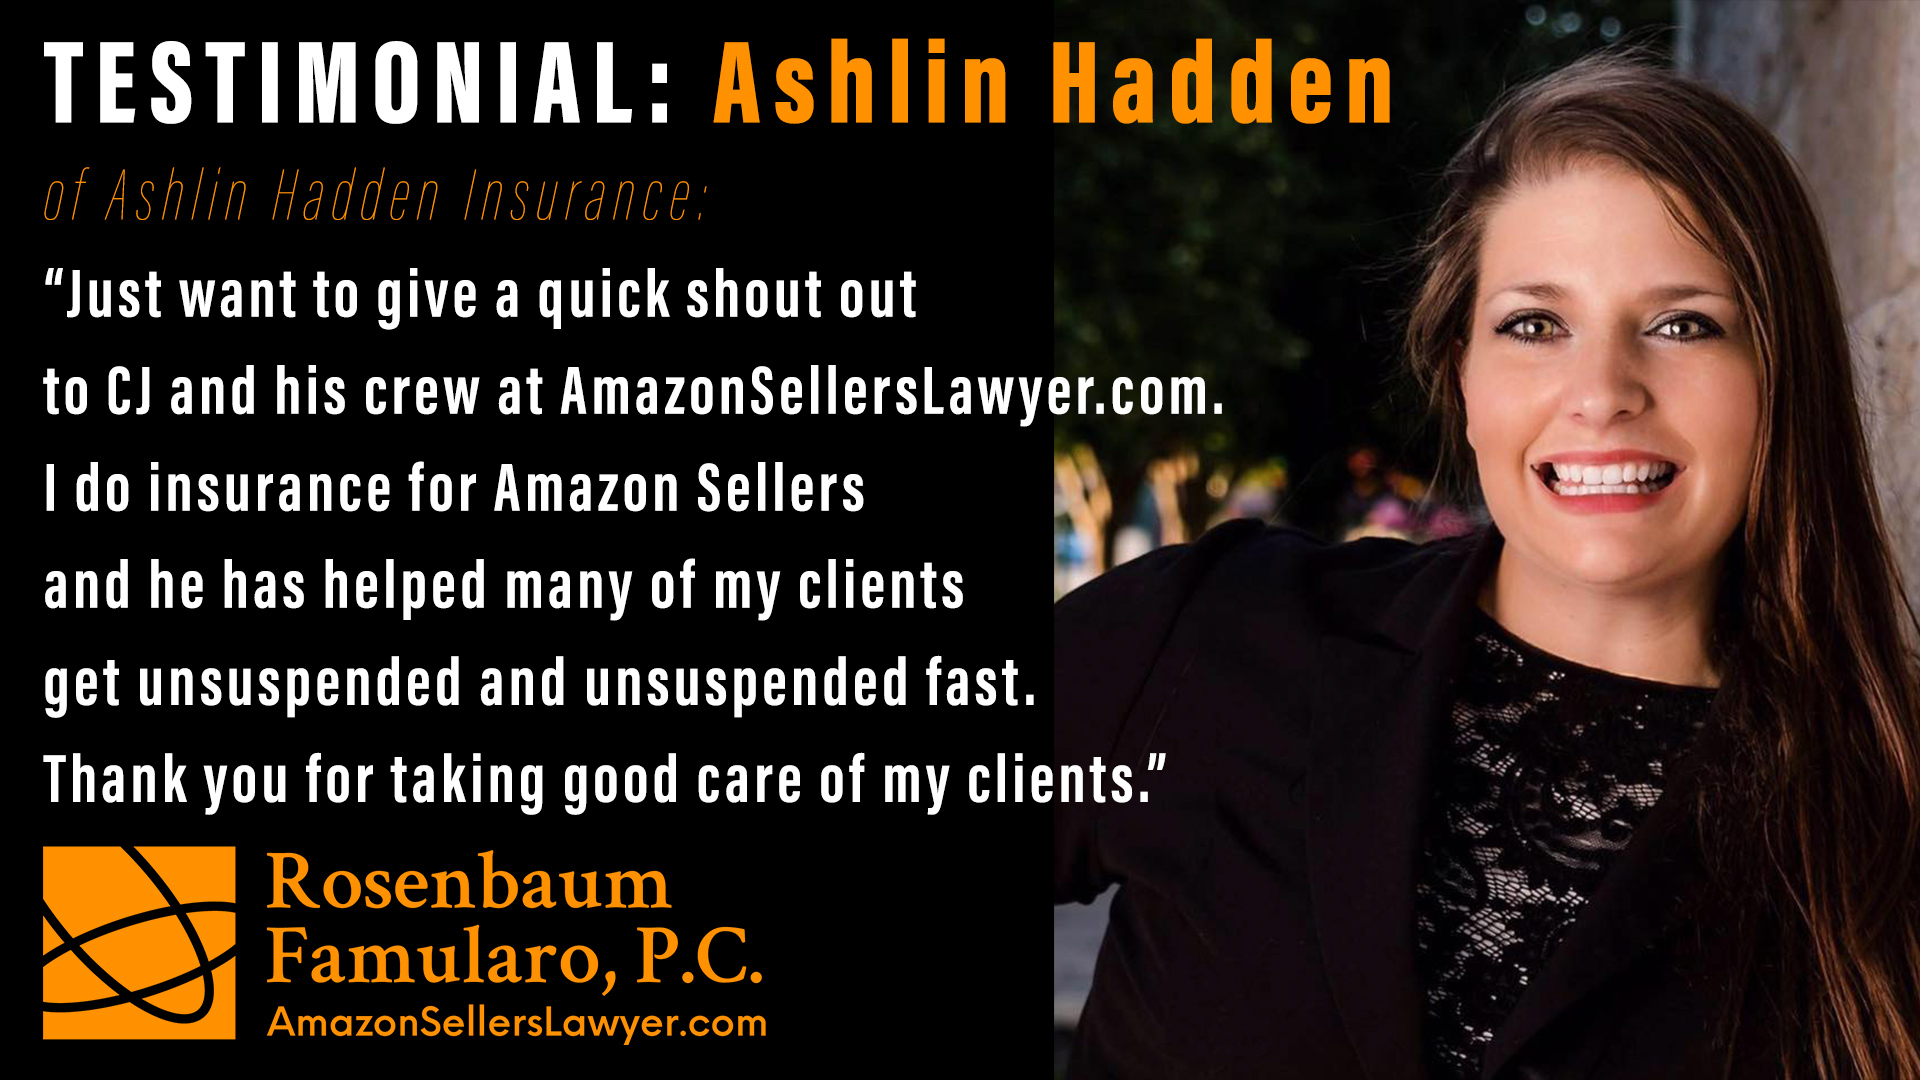 Amazon ecommerce business -Testimonial - Ashlin Hadden Insurance -insurance for Amazon Sellers